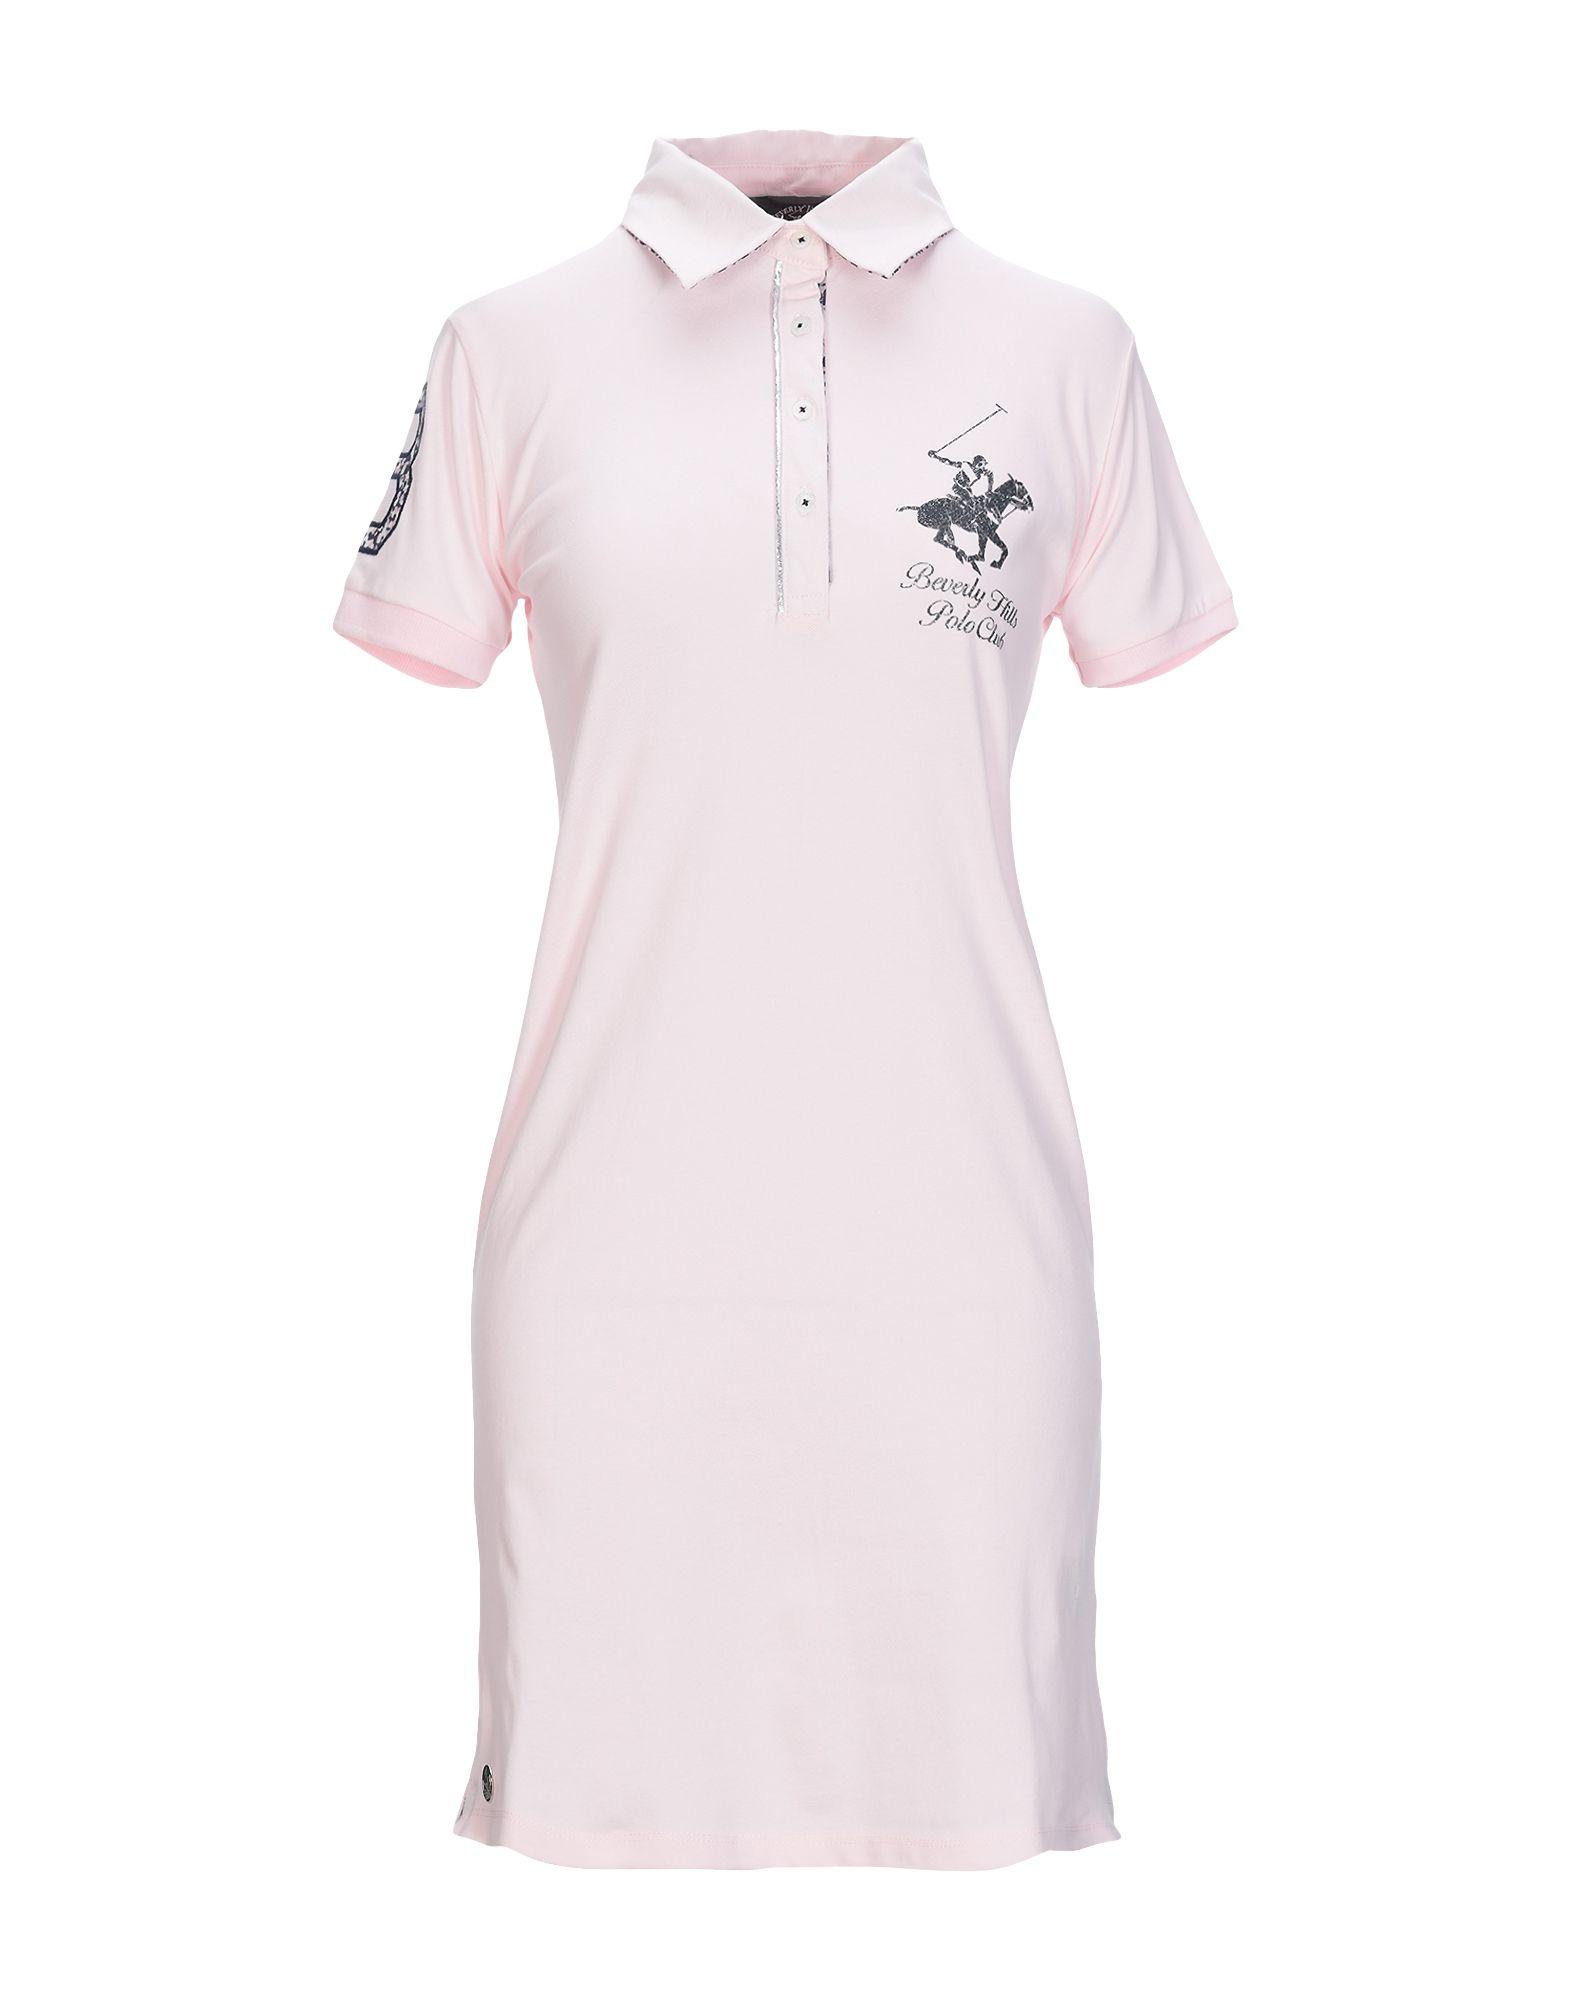 BEVERLY HILLS POLO CLUB Damen Kurzes Kleid Farbe Rosa Größe 5